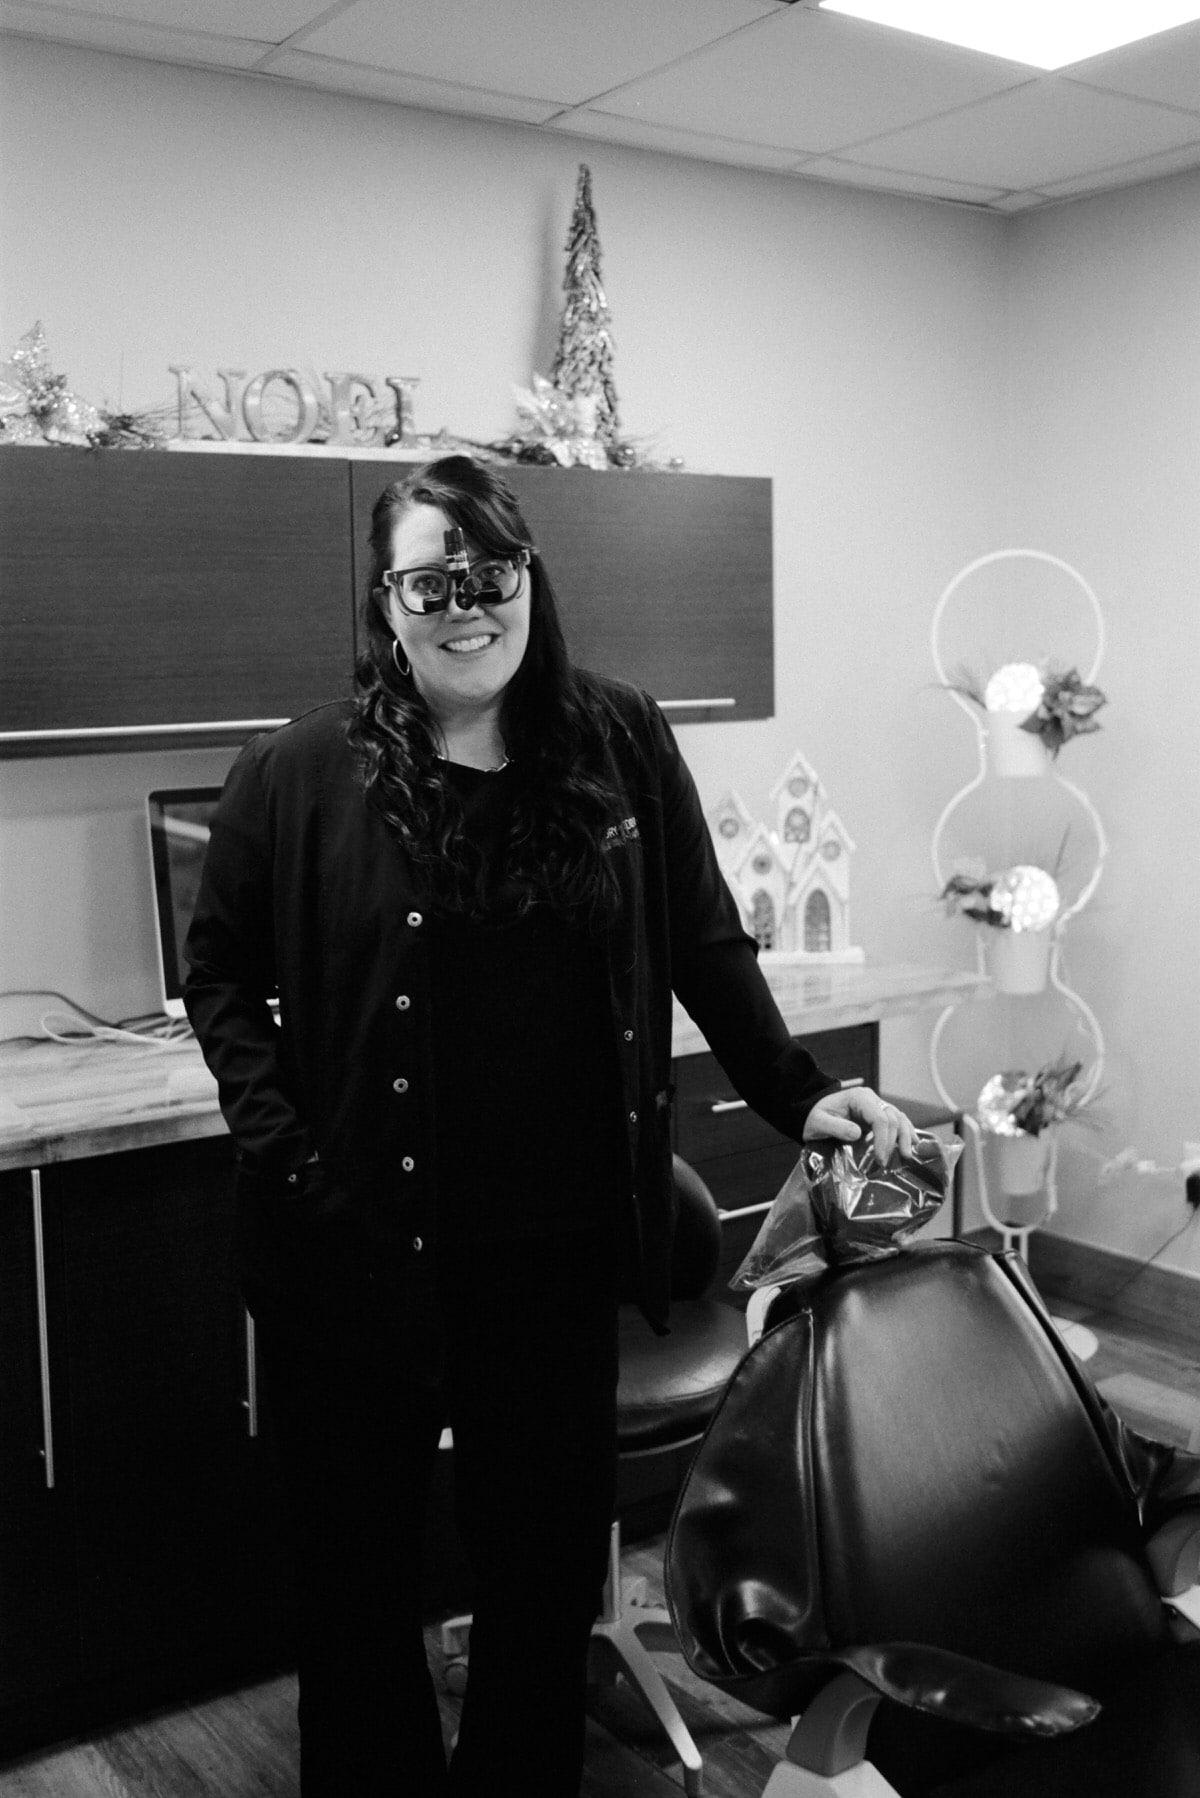 Illuminating-Women-art-exhibition-black-and-white-fine-art-film-photography-by-Studio-L-photographer-Laura-Schneider-20035